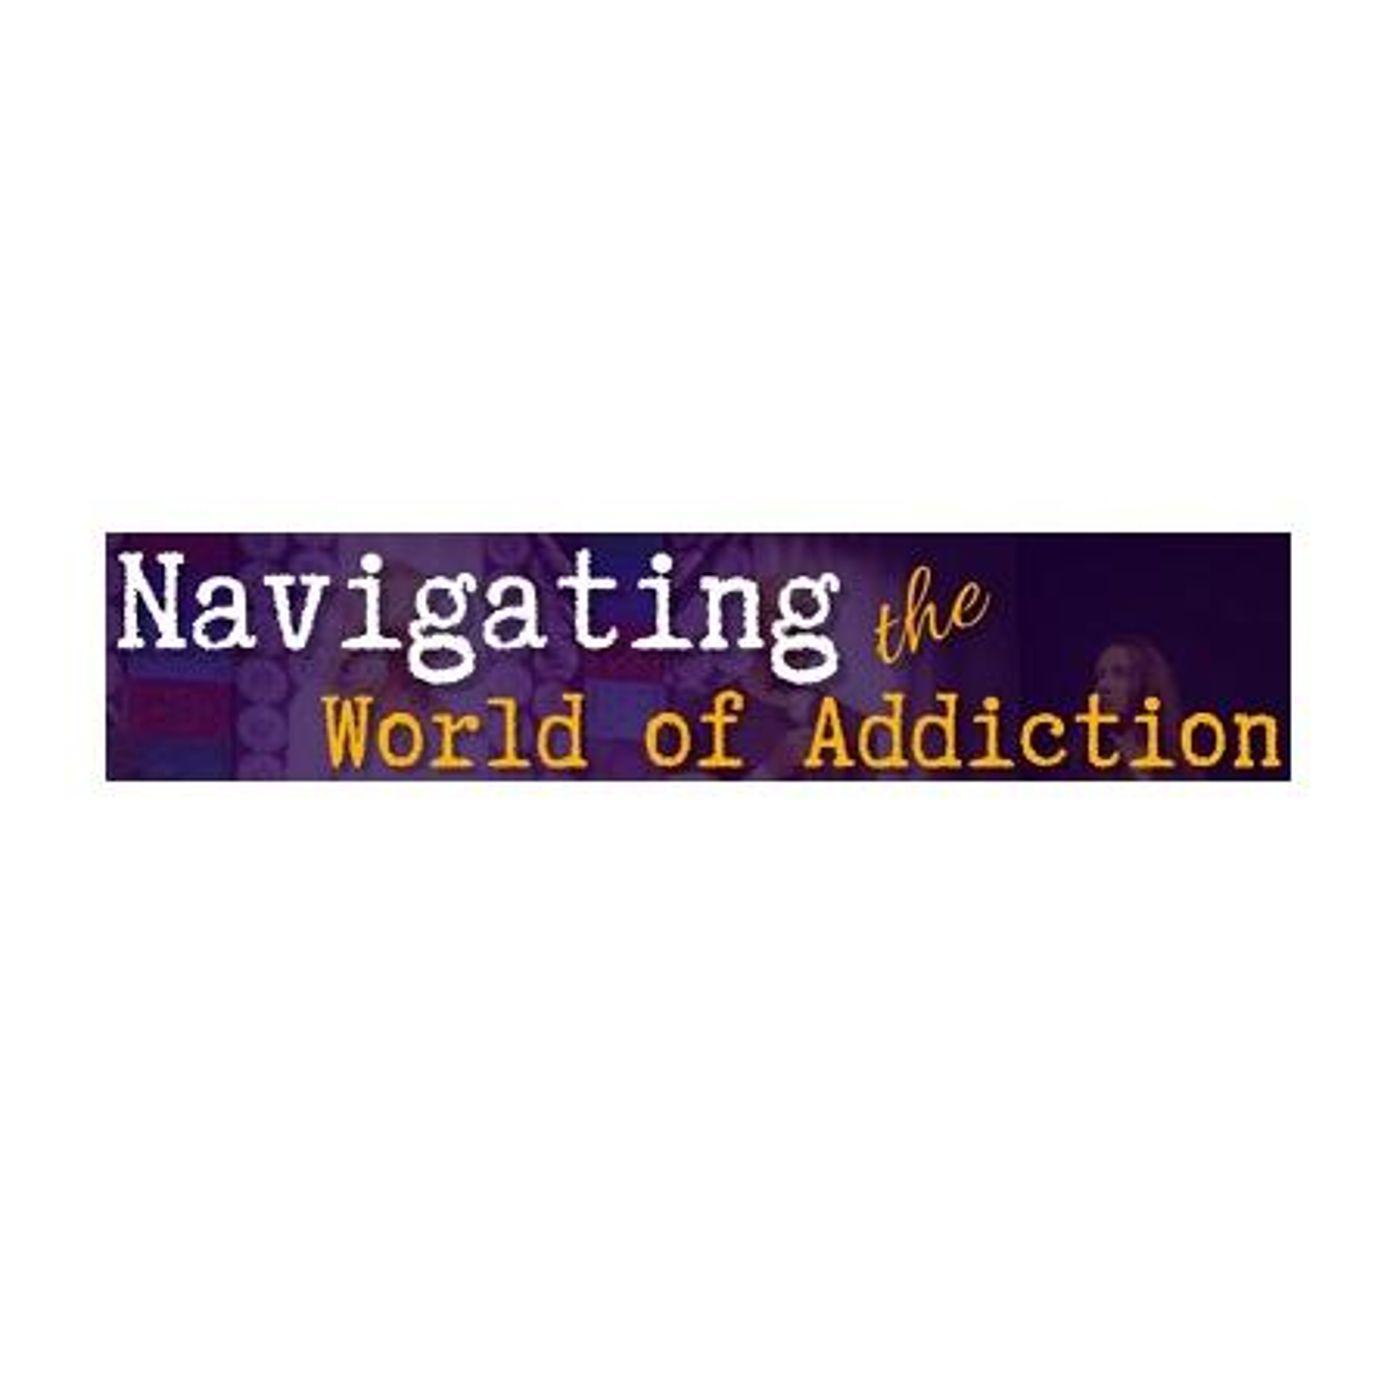 Mental Health News Radio - Navigating the World of Addiction: Fire Mountain Programs Aaron Huey